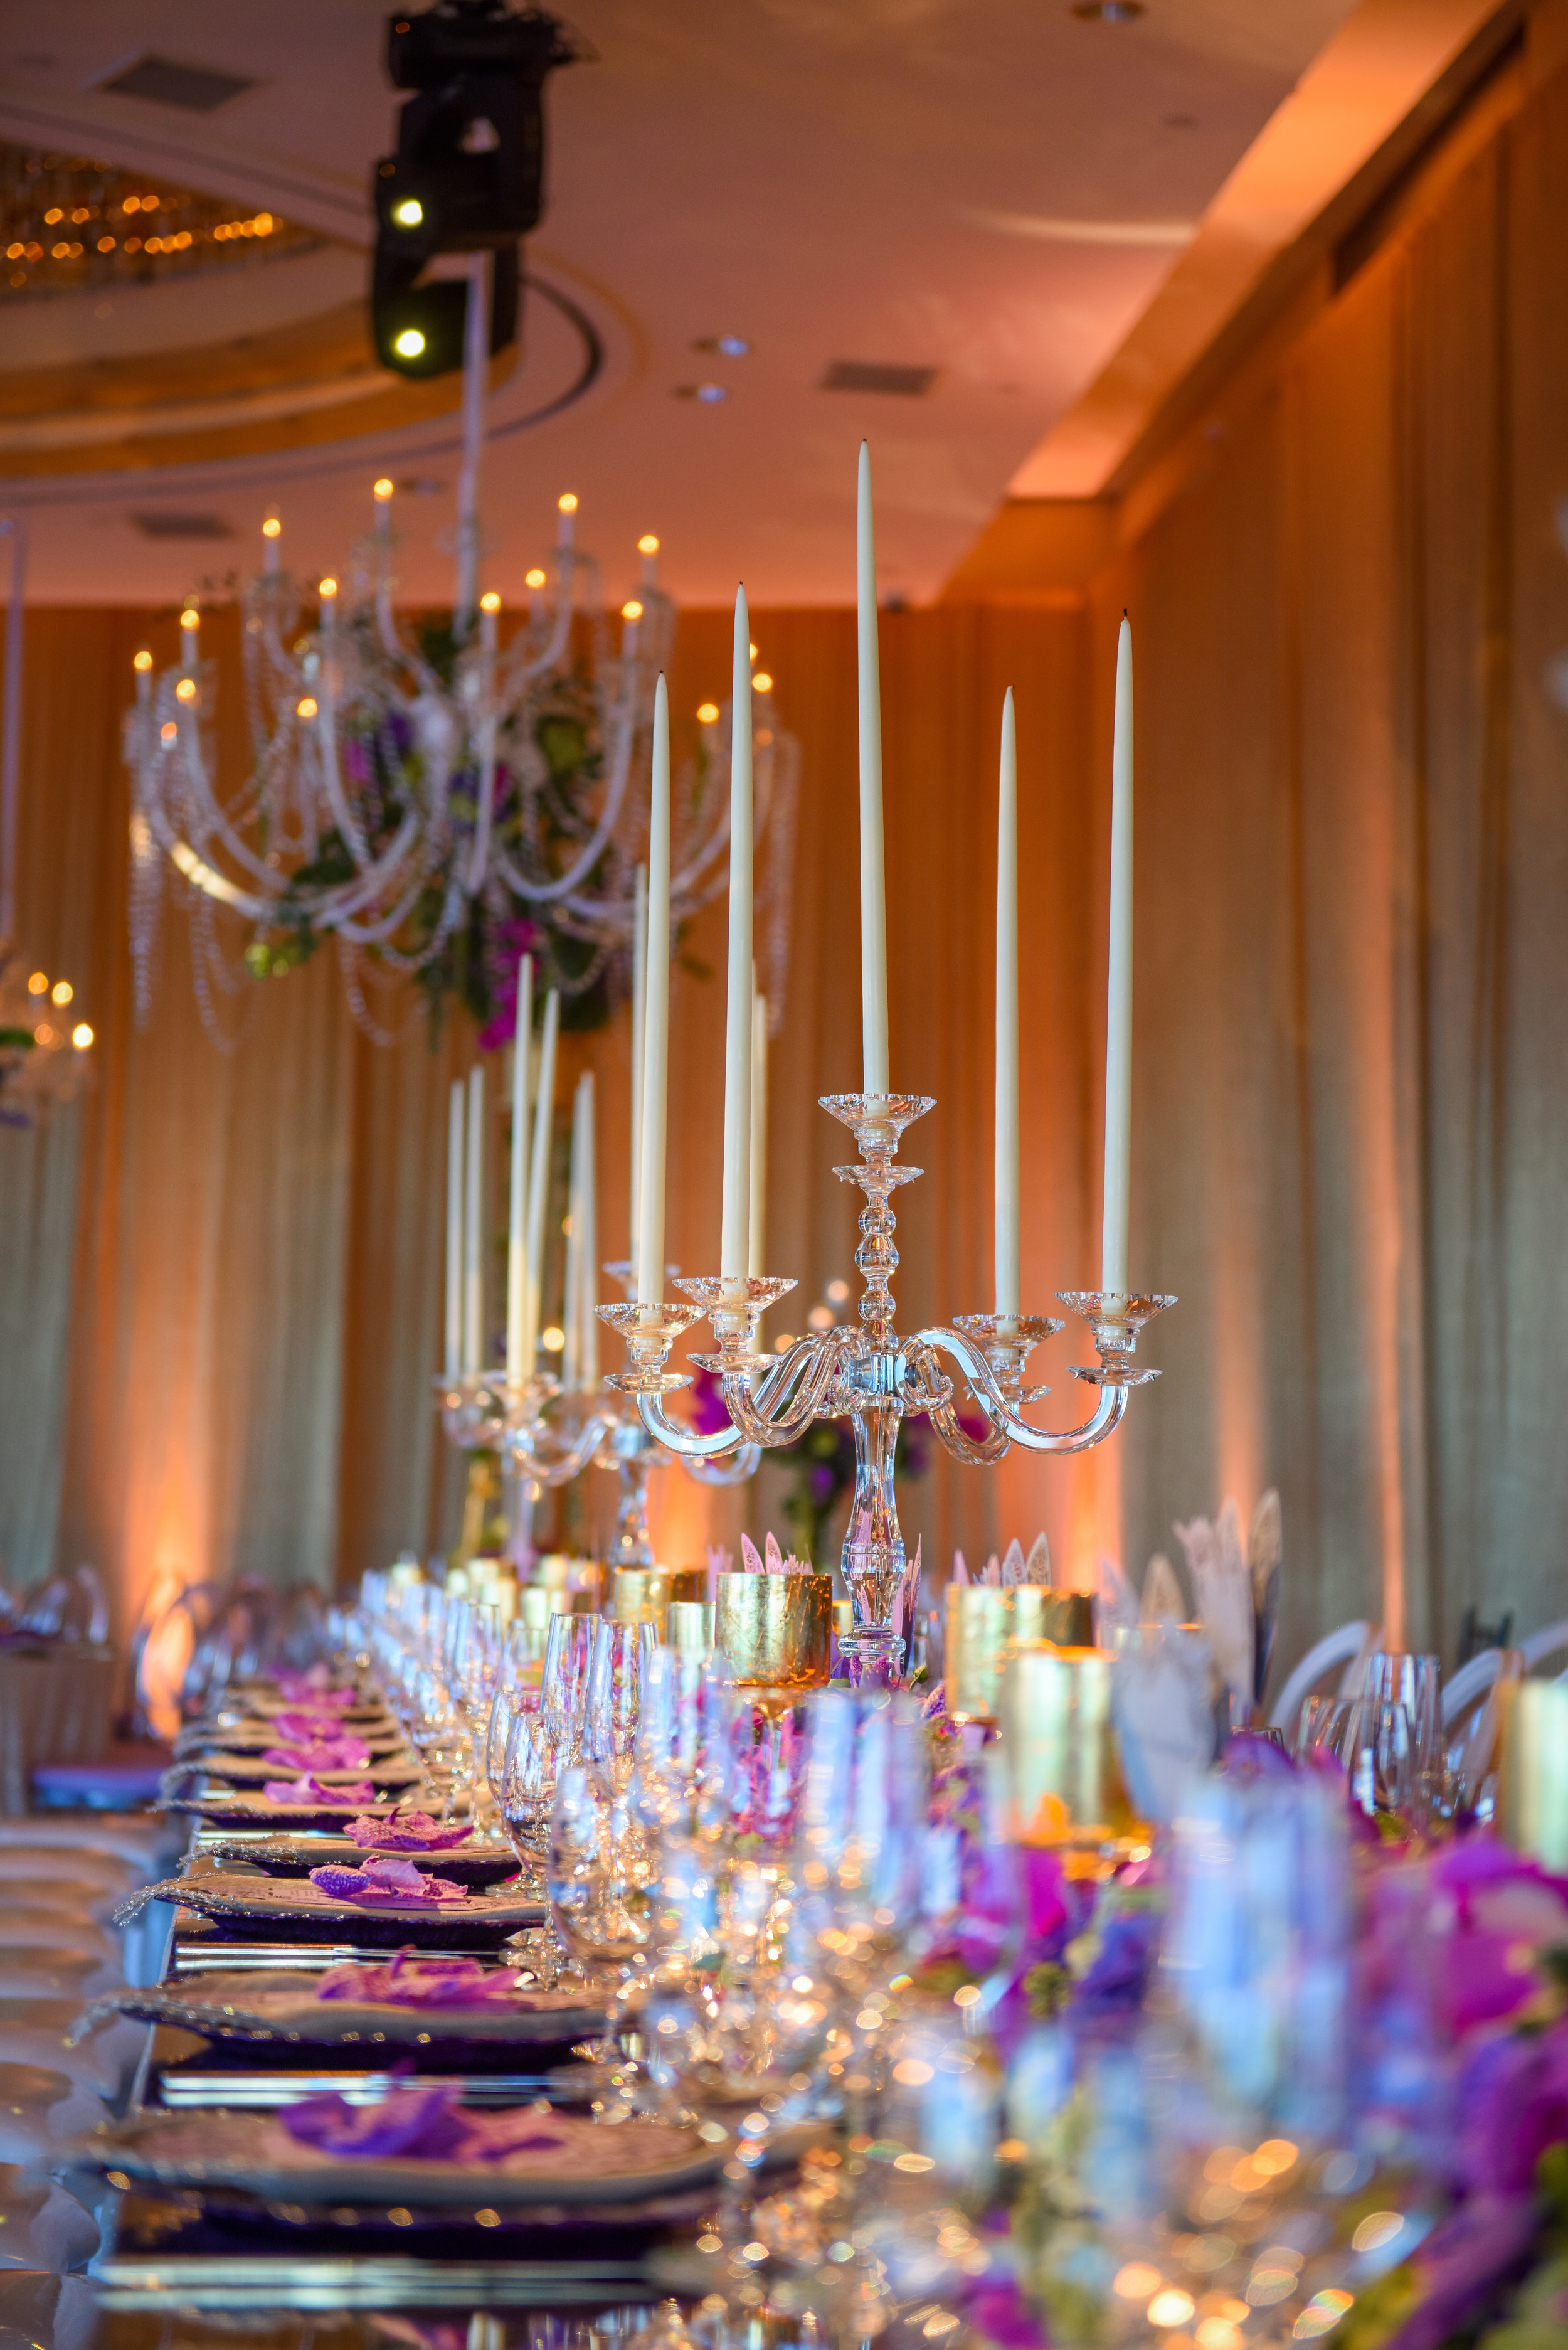 mandarin_oriental_new_york_city_branding_inspiration_lavender_silver_wedding_floral_purple_v284_27.jpg